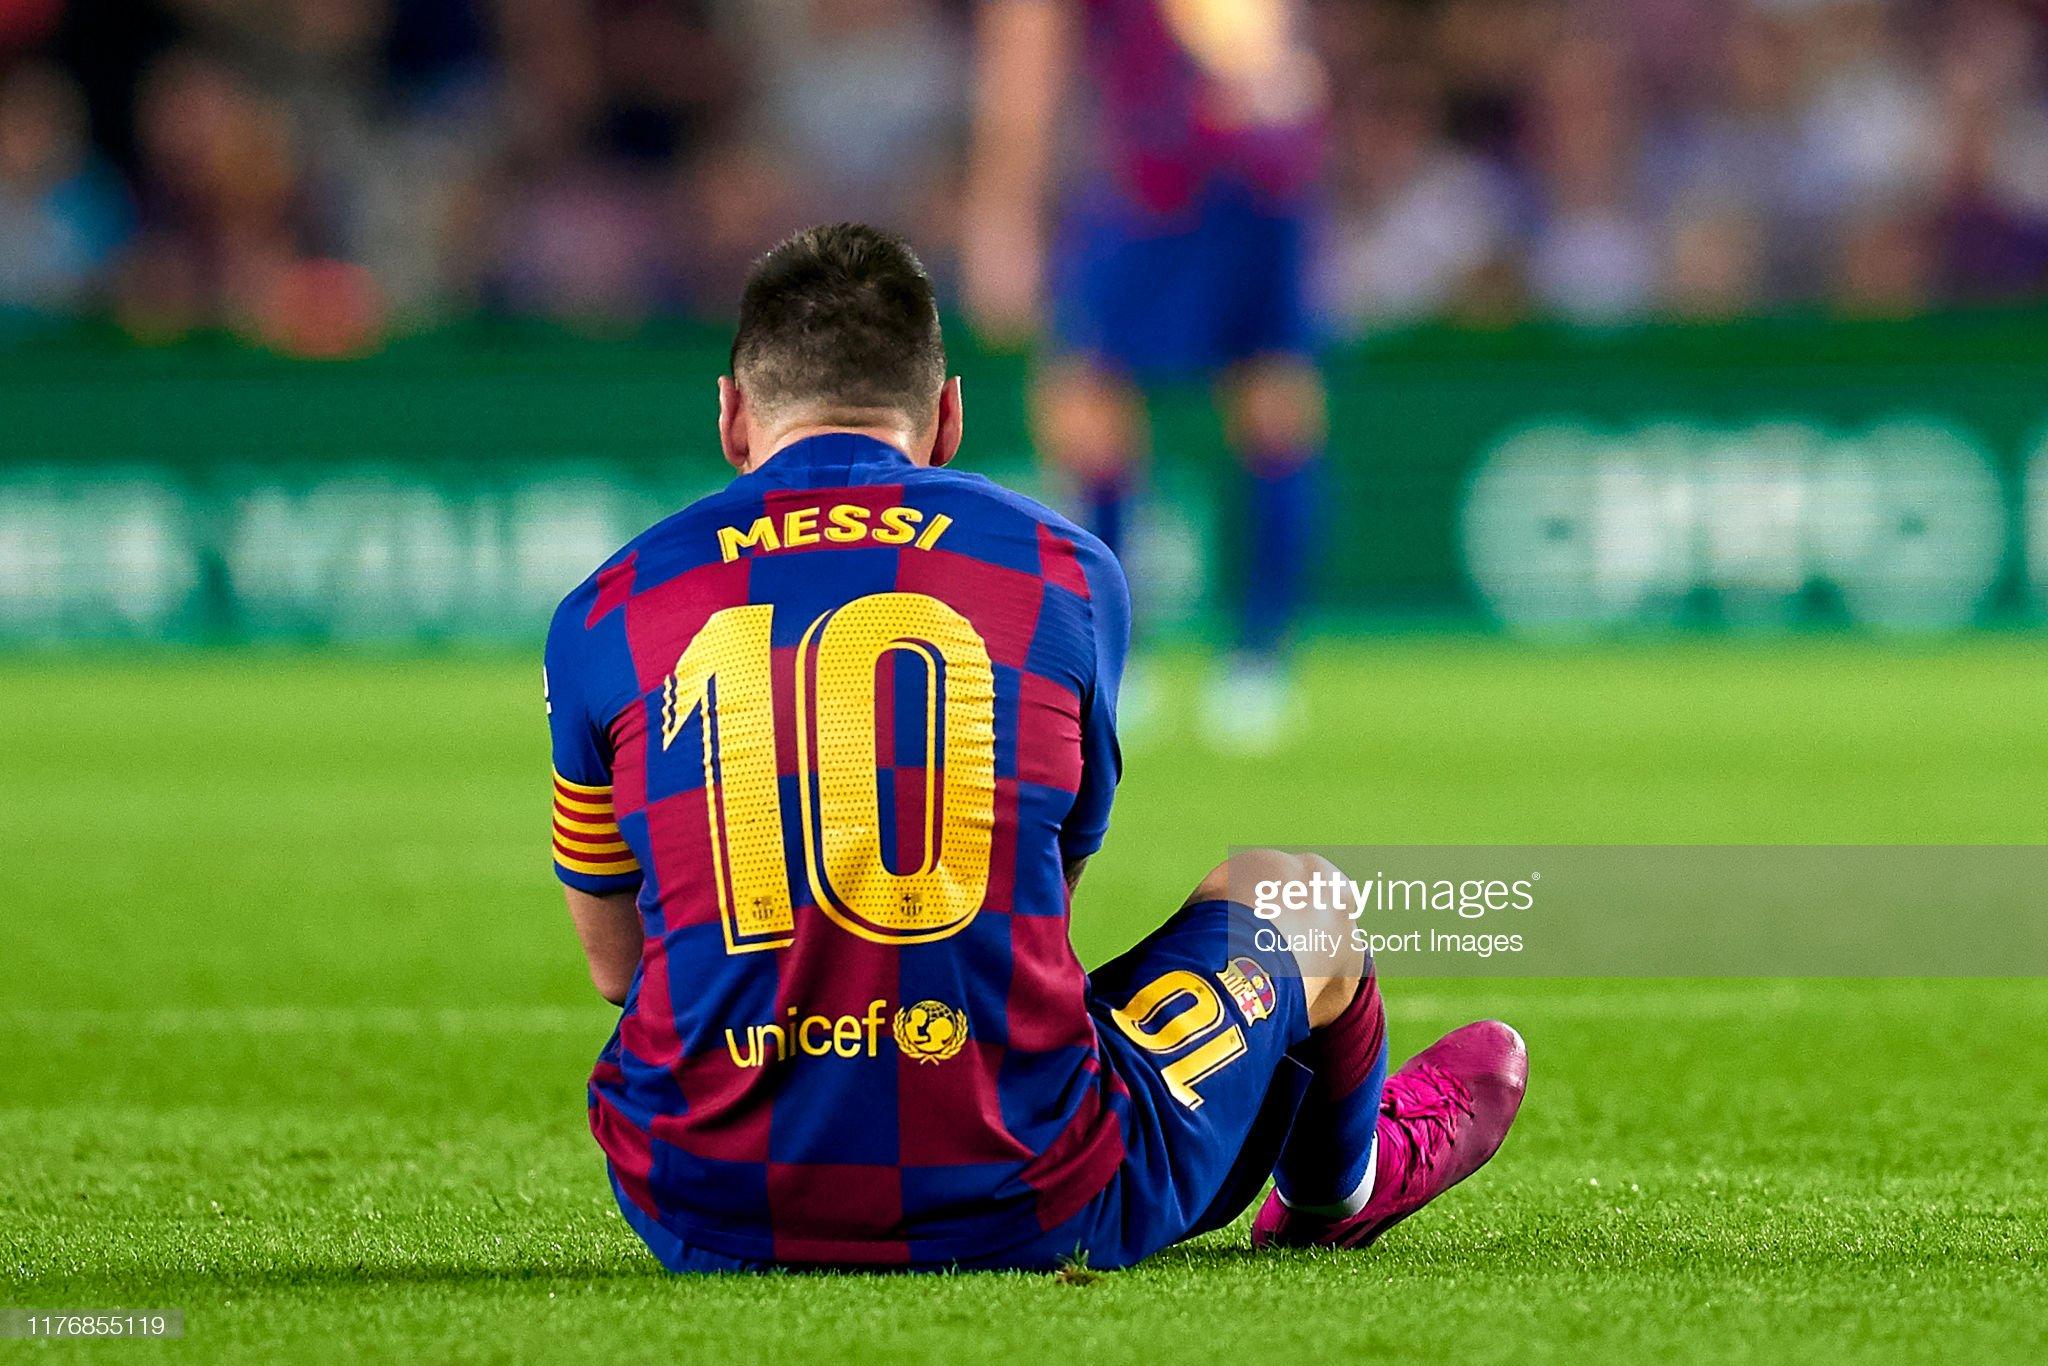 صور مباراة : برشلونة - فياريال 2-1 ( 24-09-2019 )  Lionel-messi-of-fc-barcelona-injured-over-the-pitch-during-the-liga-picture-id1176855119?s=2048x2048